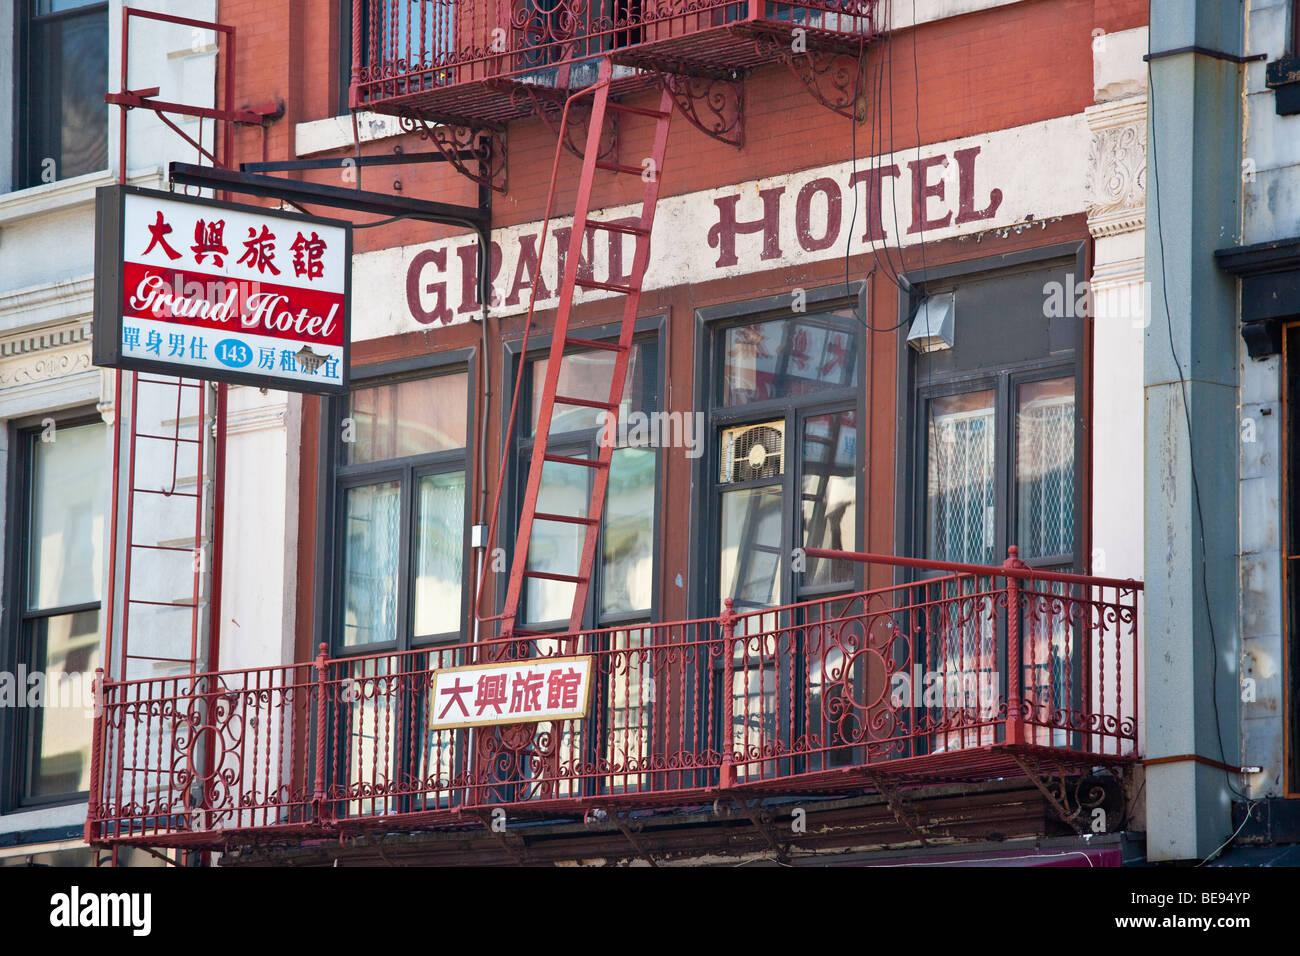 Grand Hotel in Chinatown in Manhattan New York City - Stock Image